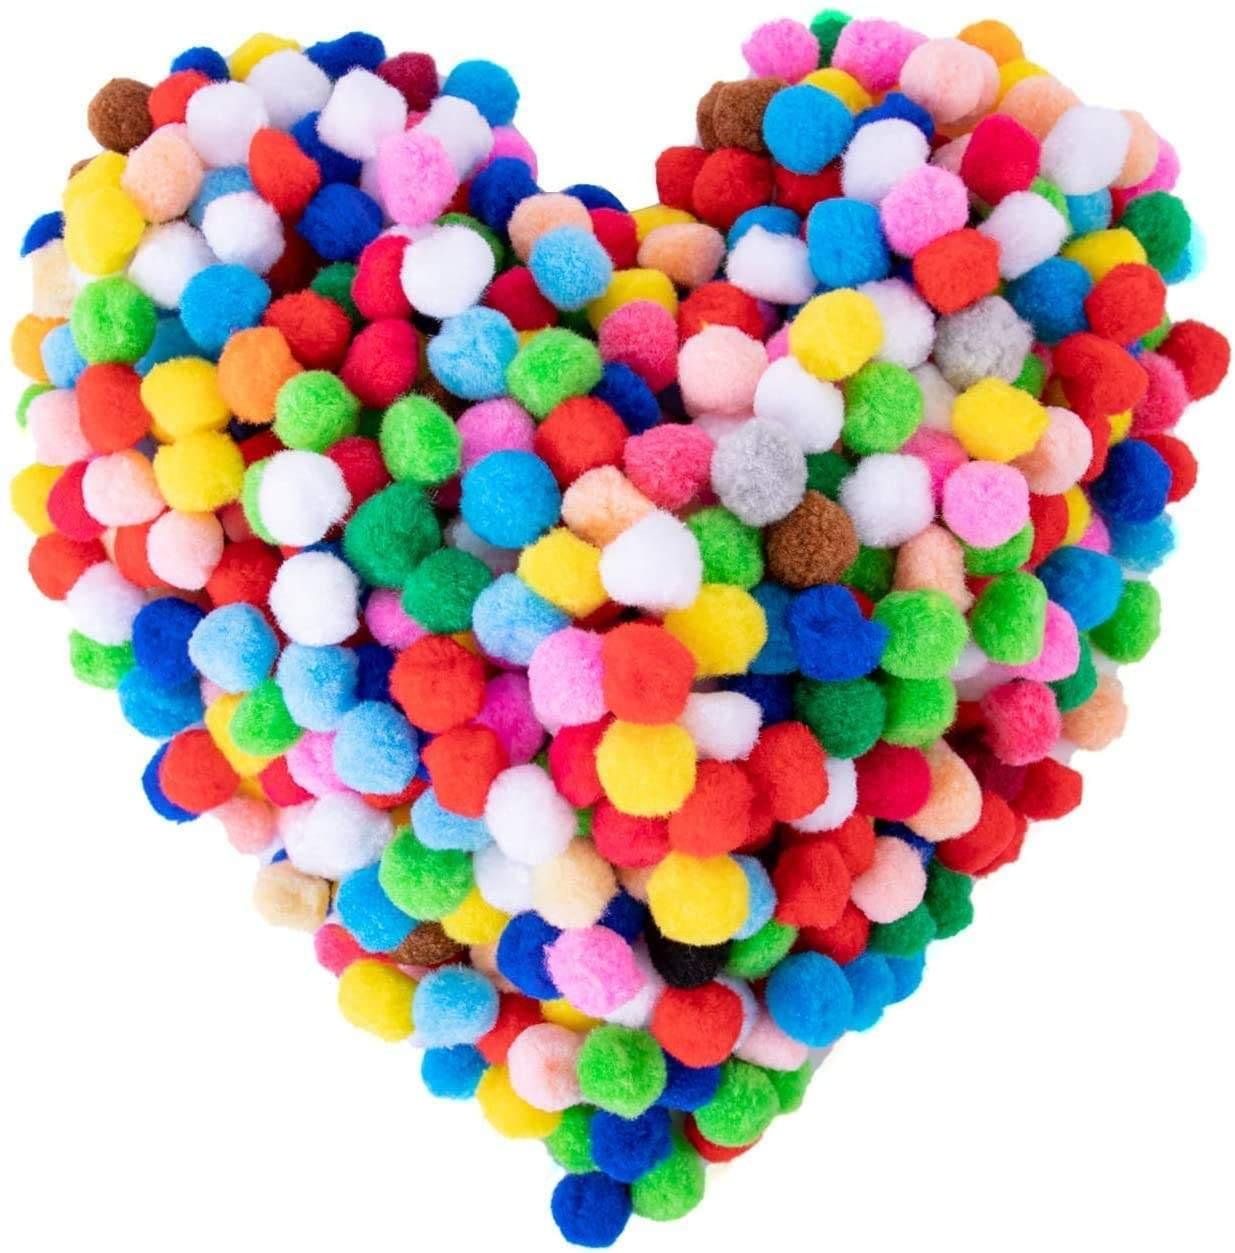 Baby shower ideas Sale on 1000 Pompoms of 1cm 1.5cm 2cm 2.5cm 3cm pompom balls Felt balls Polyester colorful balls.Home DIY Craft pompoms